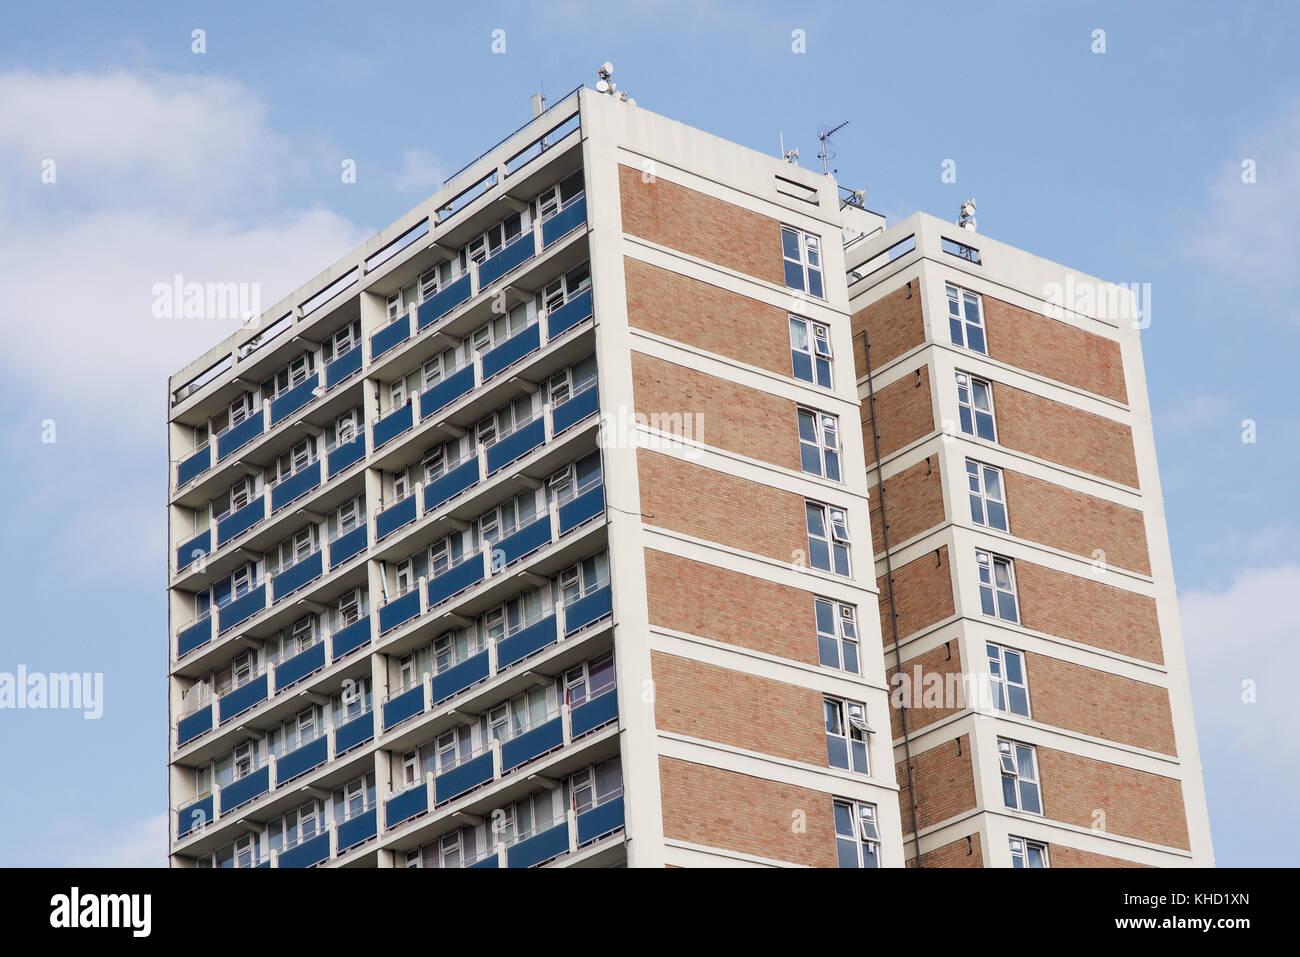 Hi-rise apartments in Shoreditch, London - Stock Image